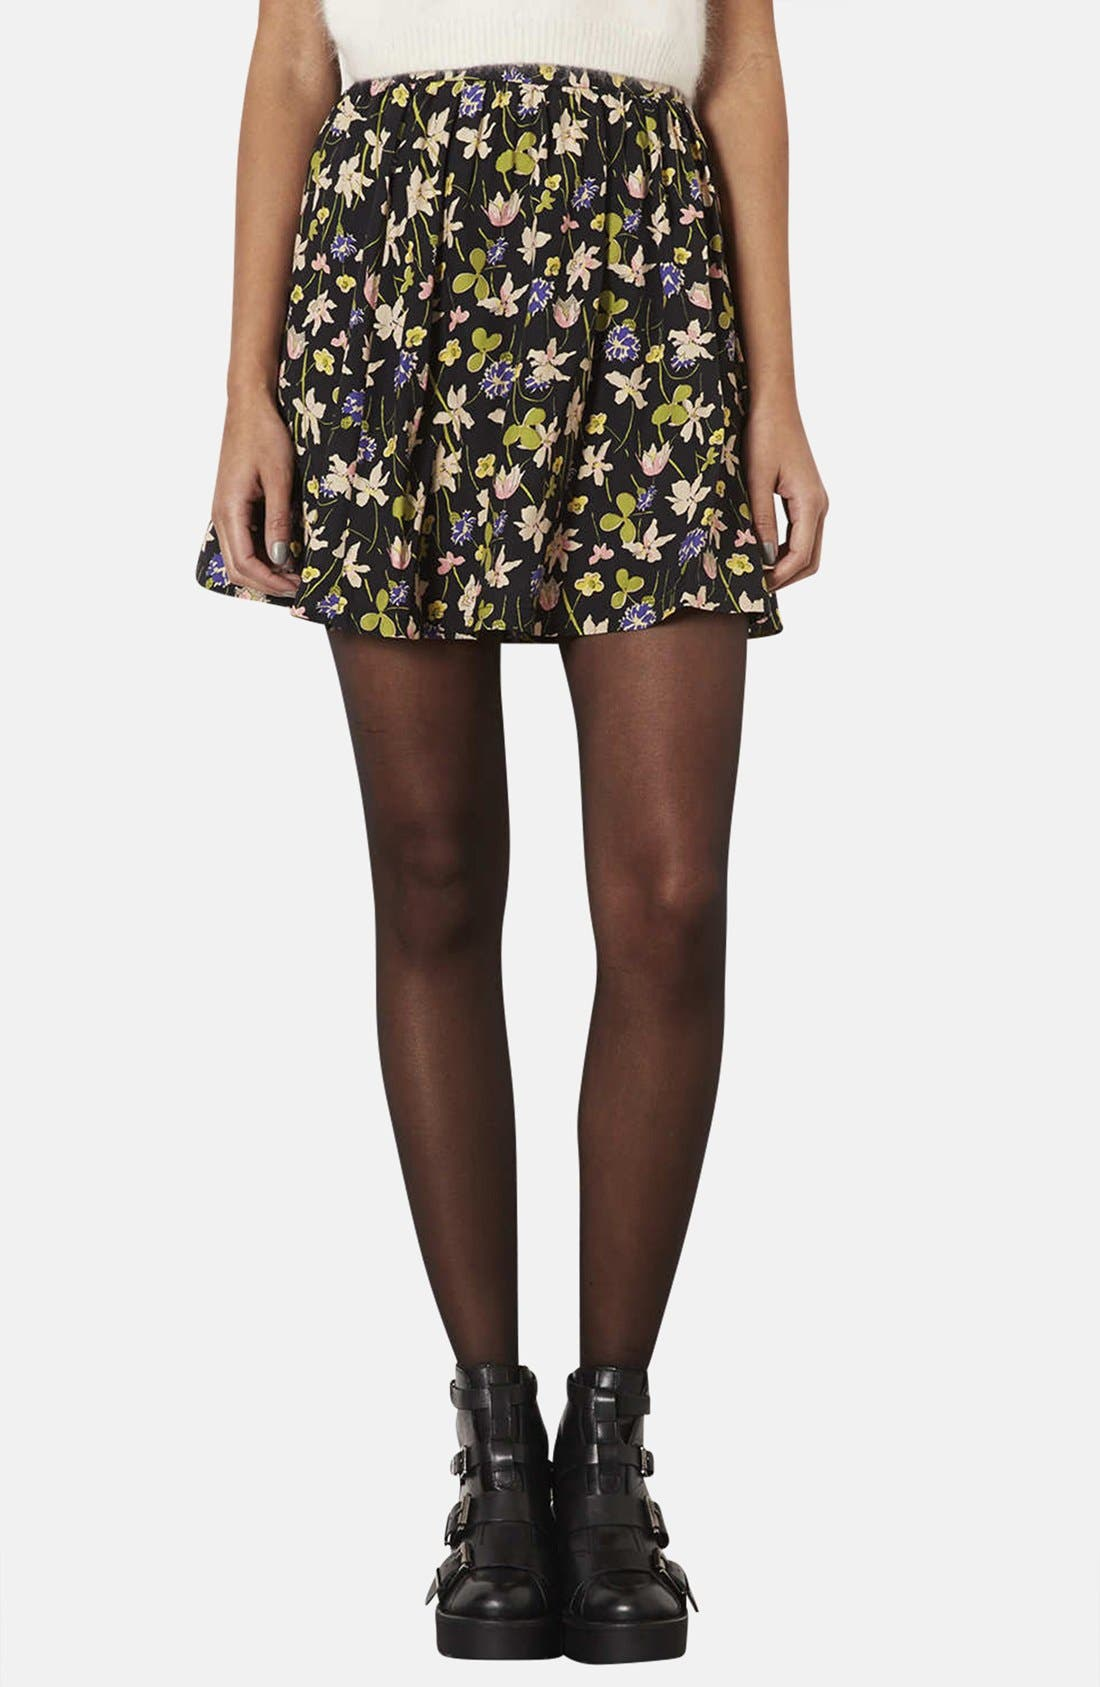 Alternate Image 1 Selected - Topshop 'Milly' Wildflower Print Skirt